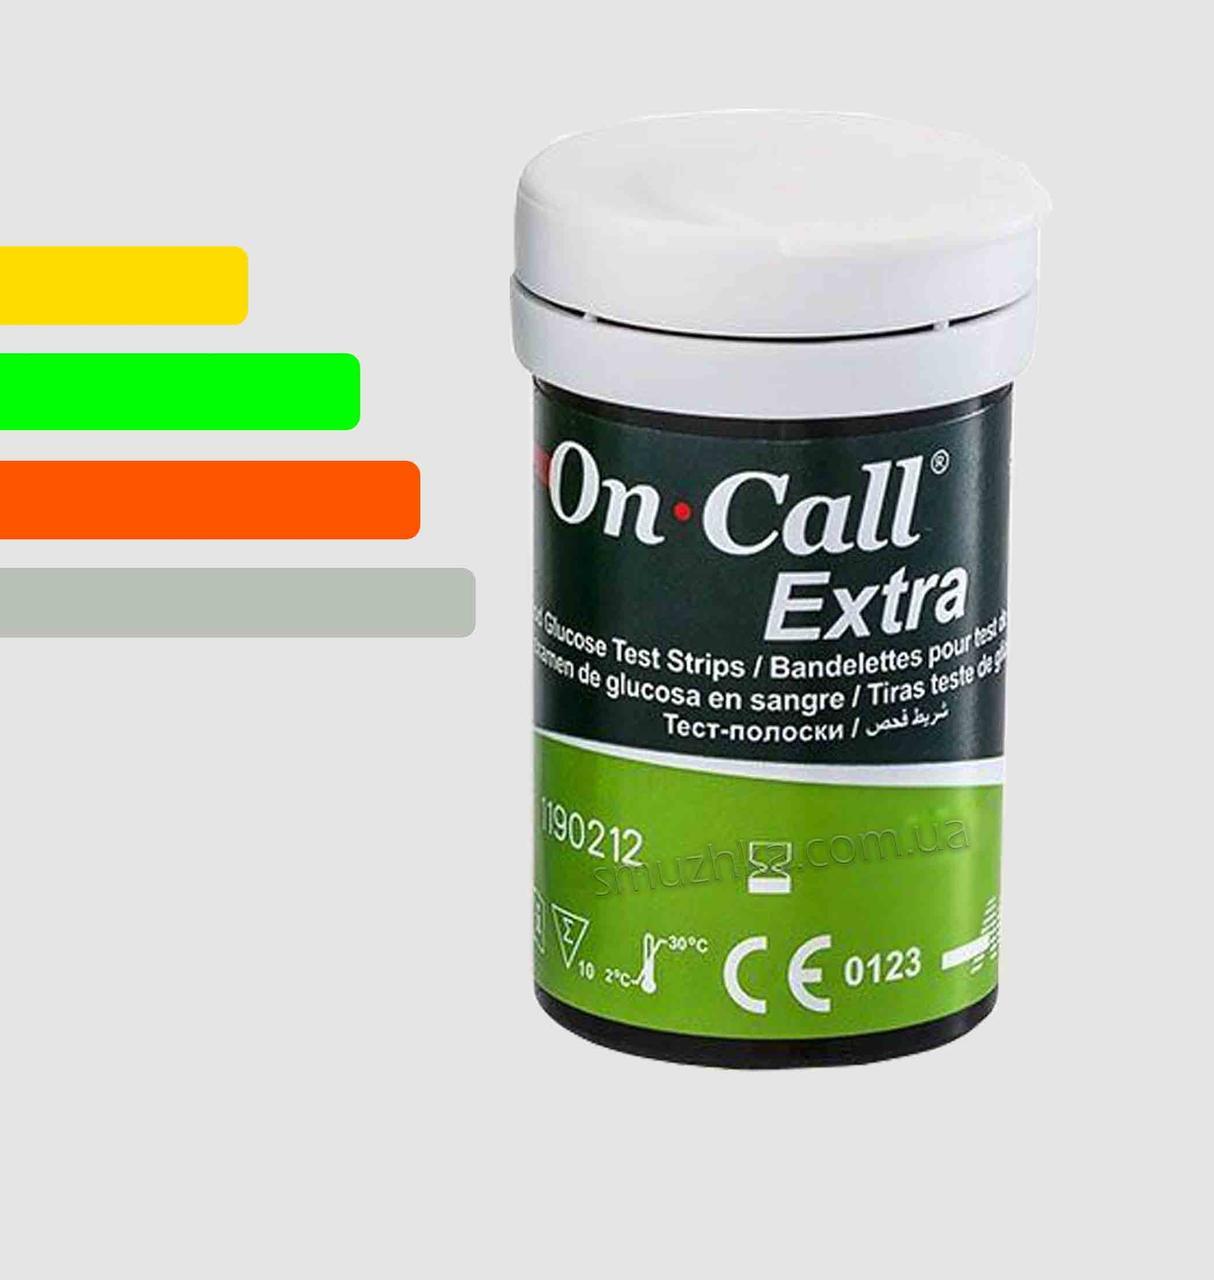 Тест полоски для глюкометра On Call Extra #25 - Онкол Экстра 25шт.